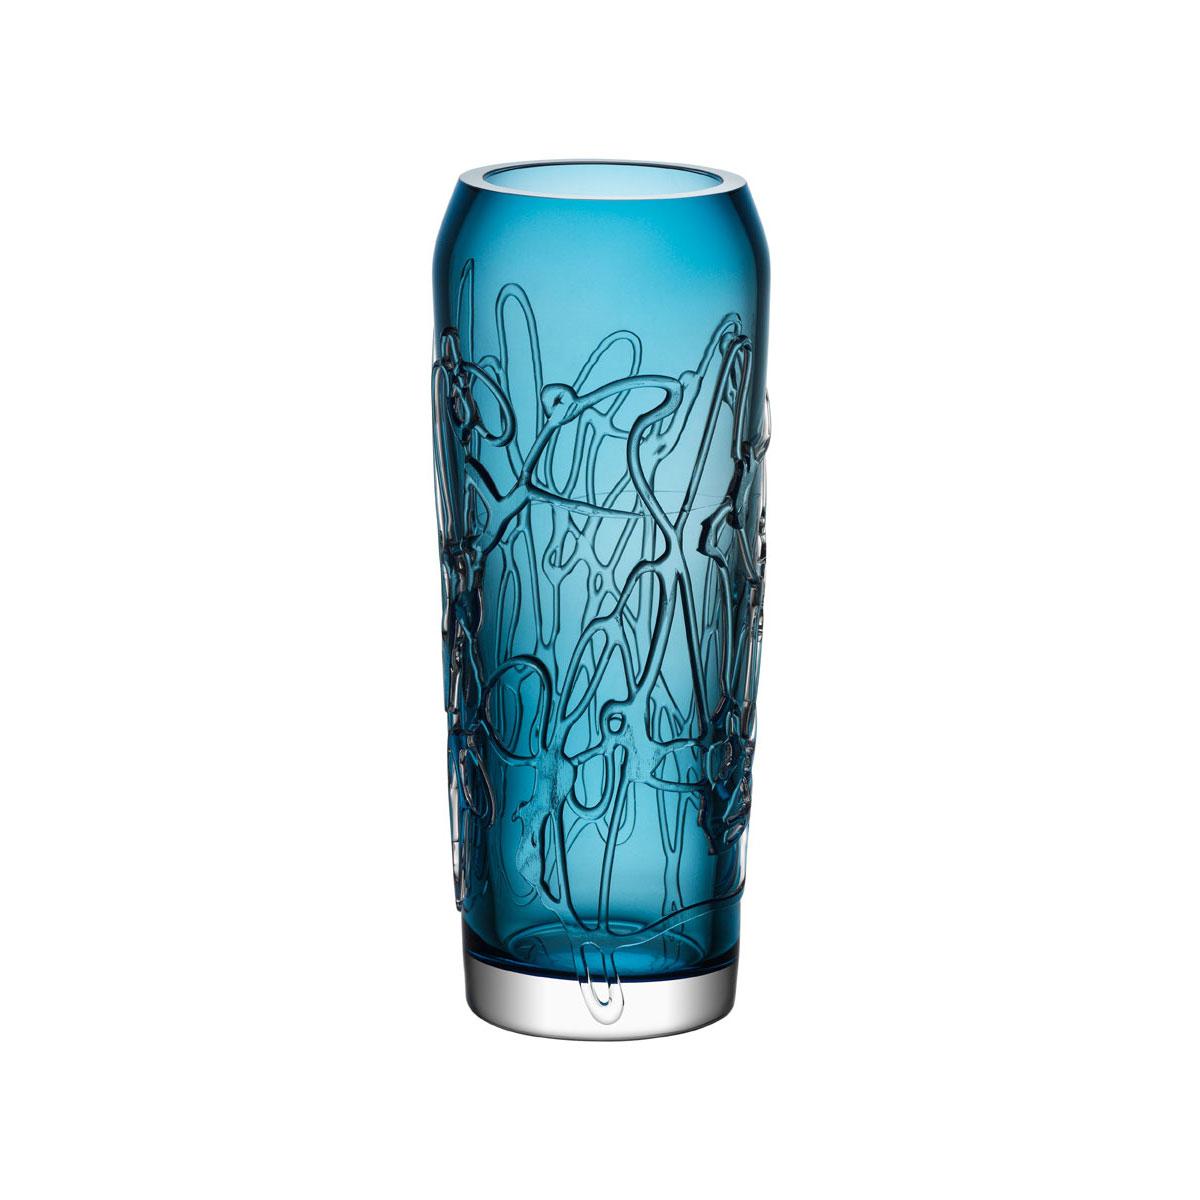 "Kosta Boda Twine 11 3/4"" Blue Crystal Vase"